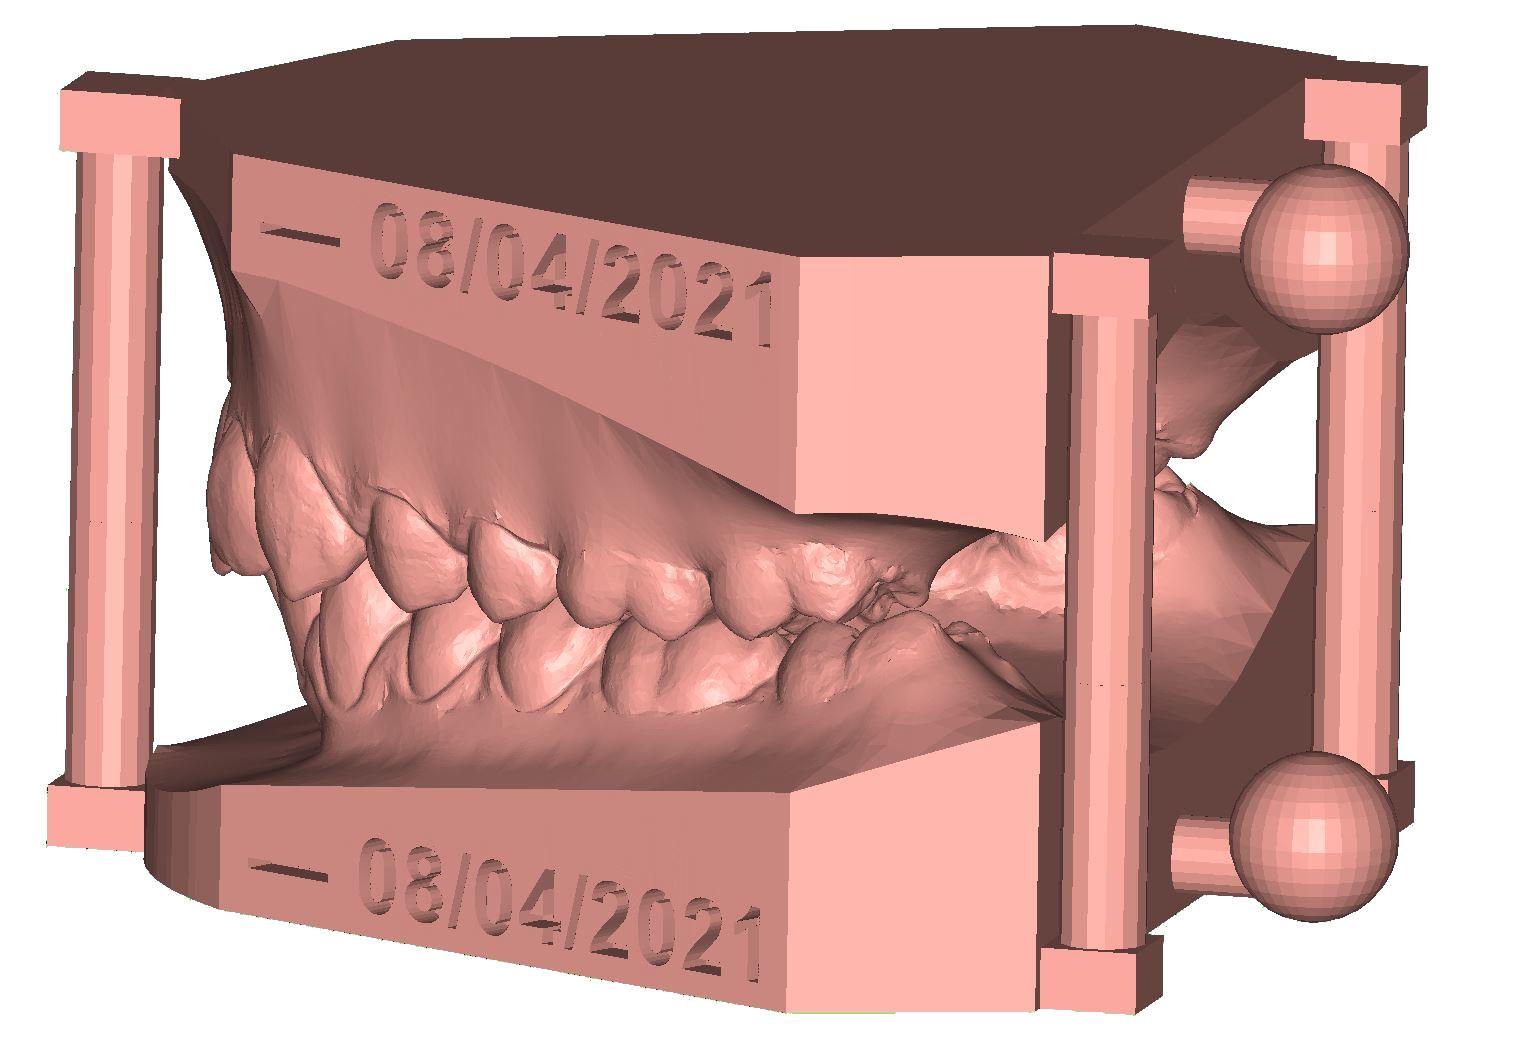 Arch Base Virtual model creation